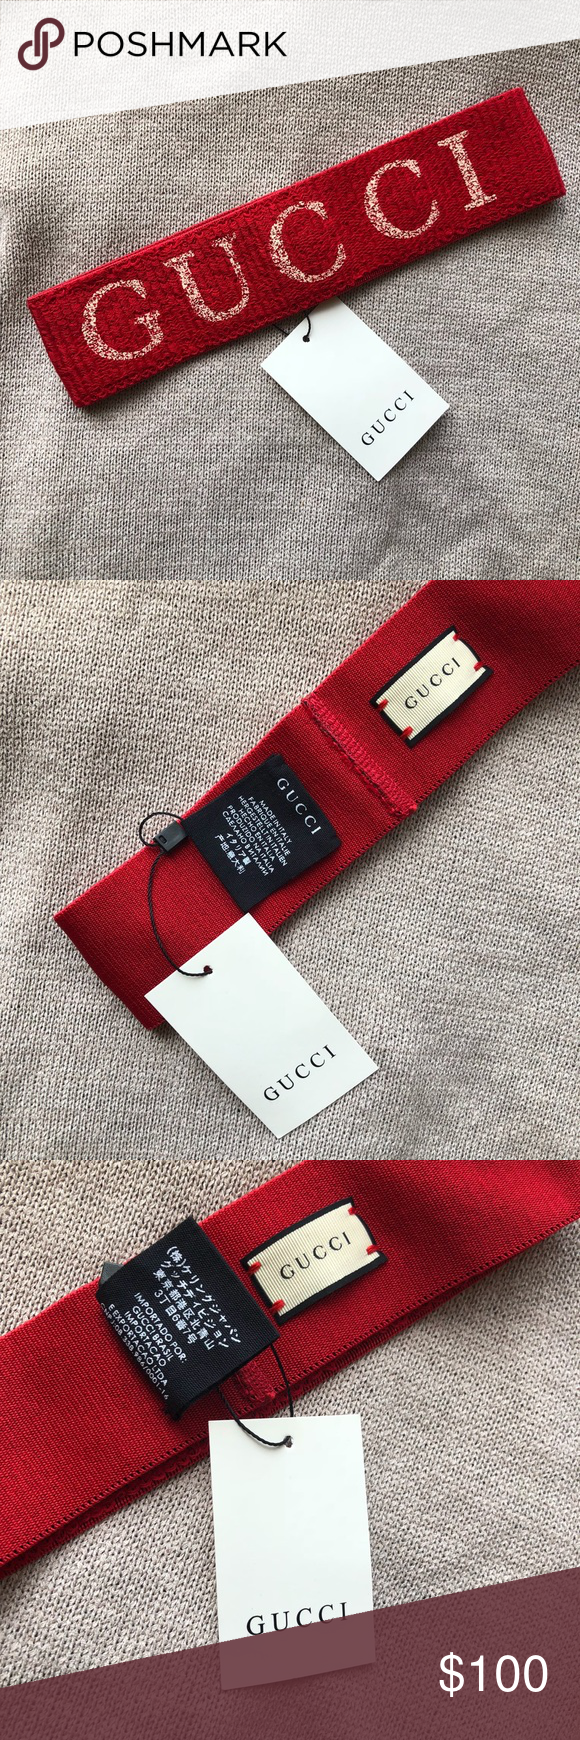 88c950a0240 New Gucci Elastic Headband V0163 Newww Gucci Accessories Hair Accessories.  New Gucci Elastic Stripe Headband with tags .